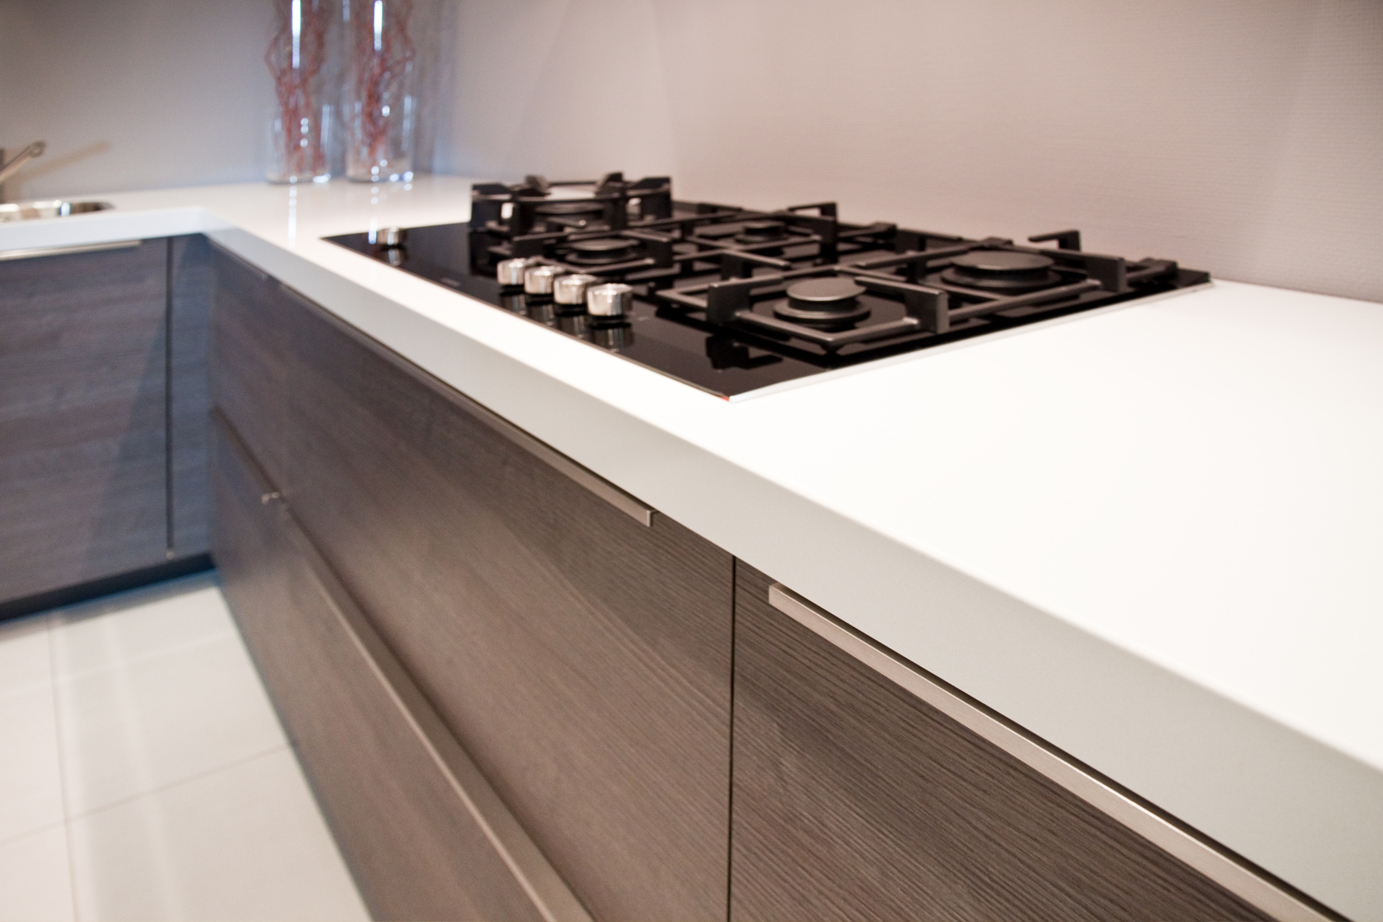 Keuken Zonder Bovenkastjes : Rechte Keuken Zonder Bovenkastjes : Design keuken mooi strak, zonder